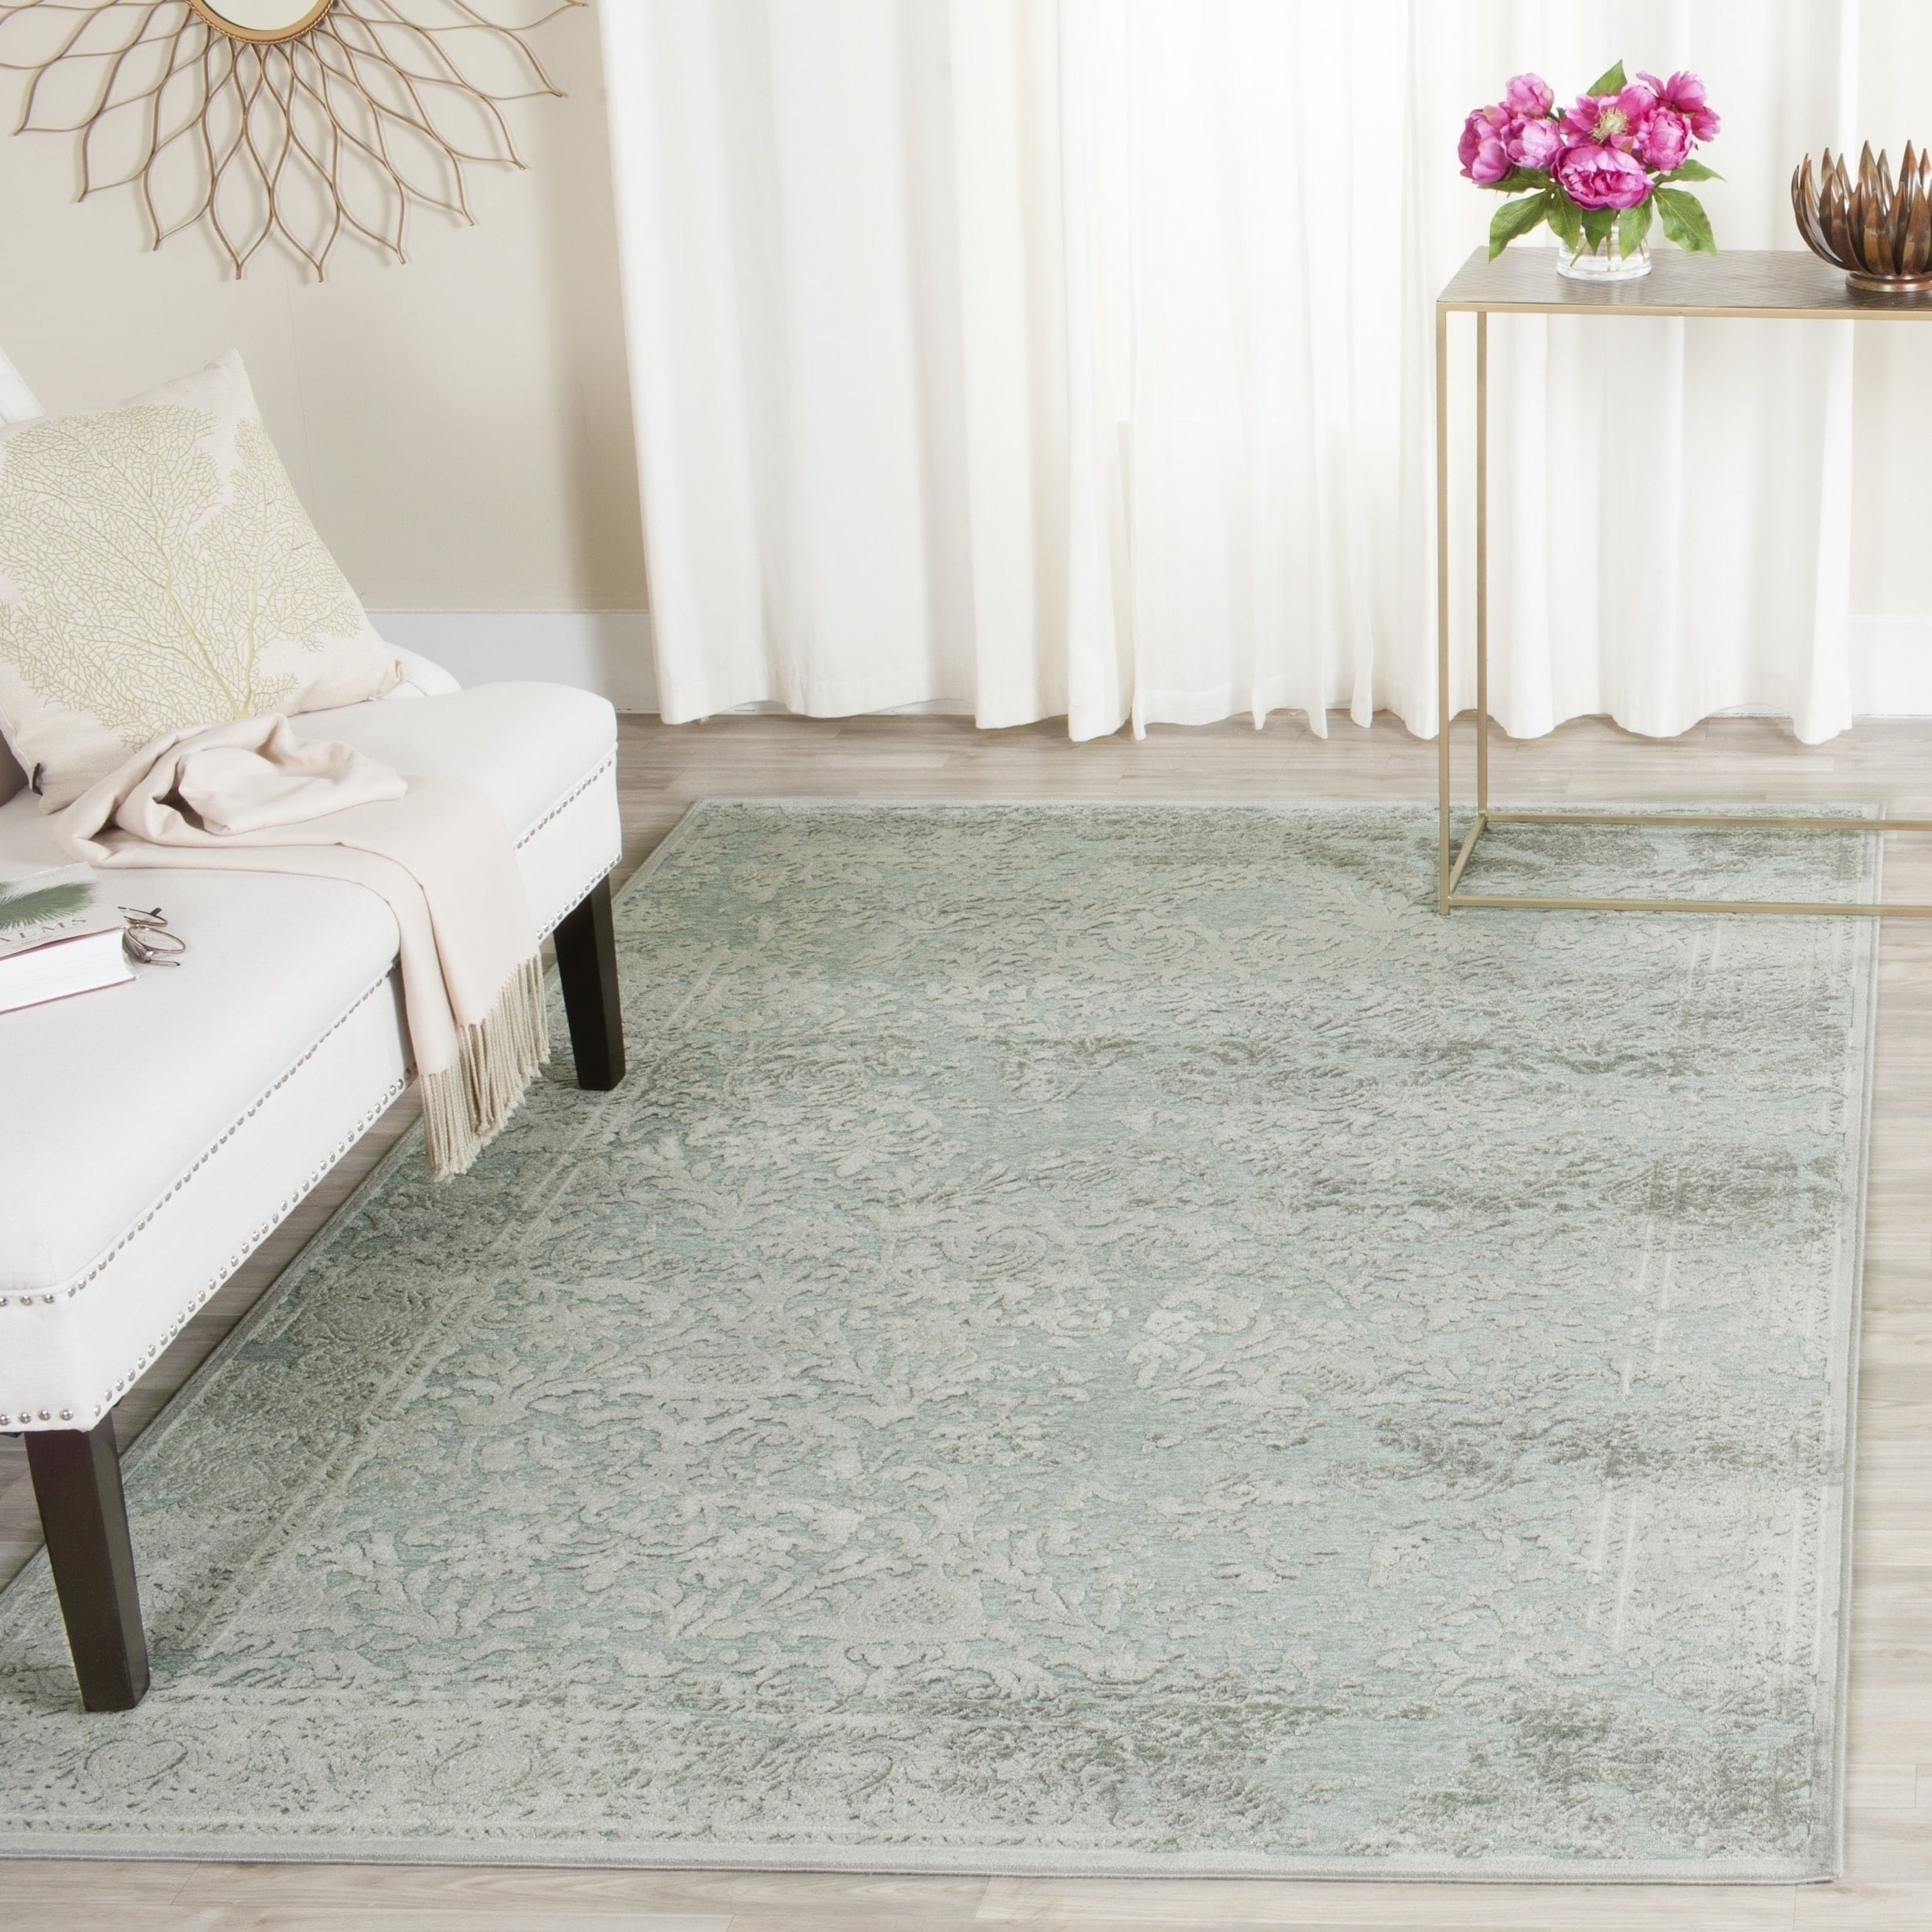 Safavieh paradise light grey spruce viscose rug 8 x 11 2